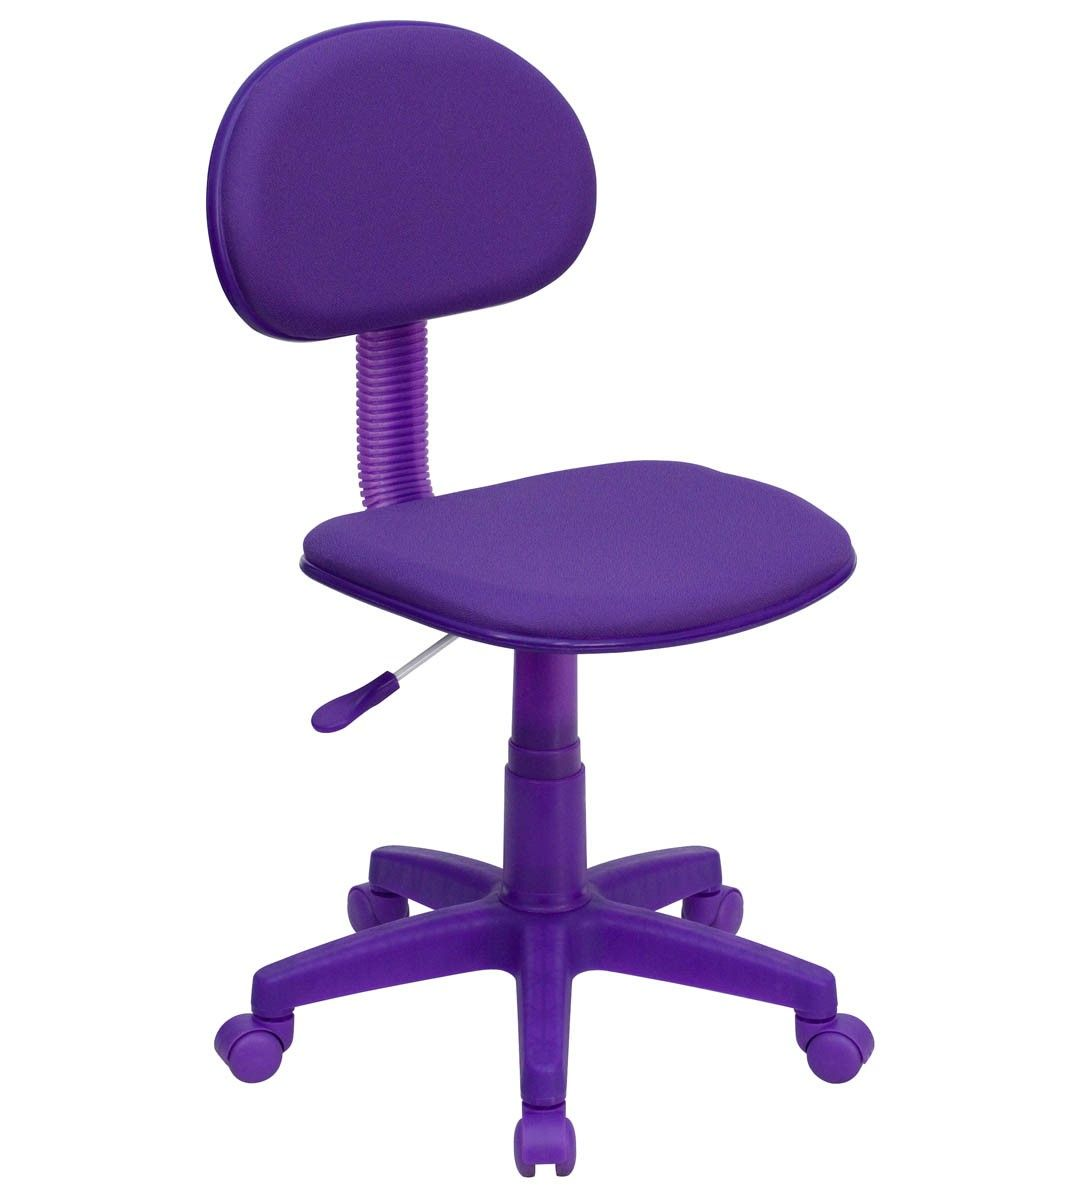 Sensational Purple Desk Chair For Kids Decorating Inspiration 11258 Ncnpc Chair Design For Home Ncnpcorg